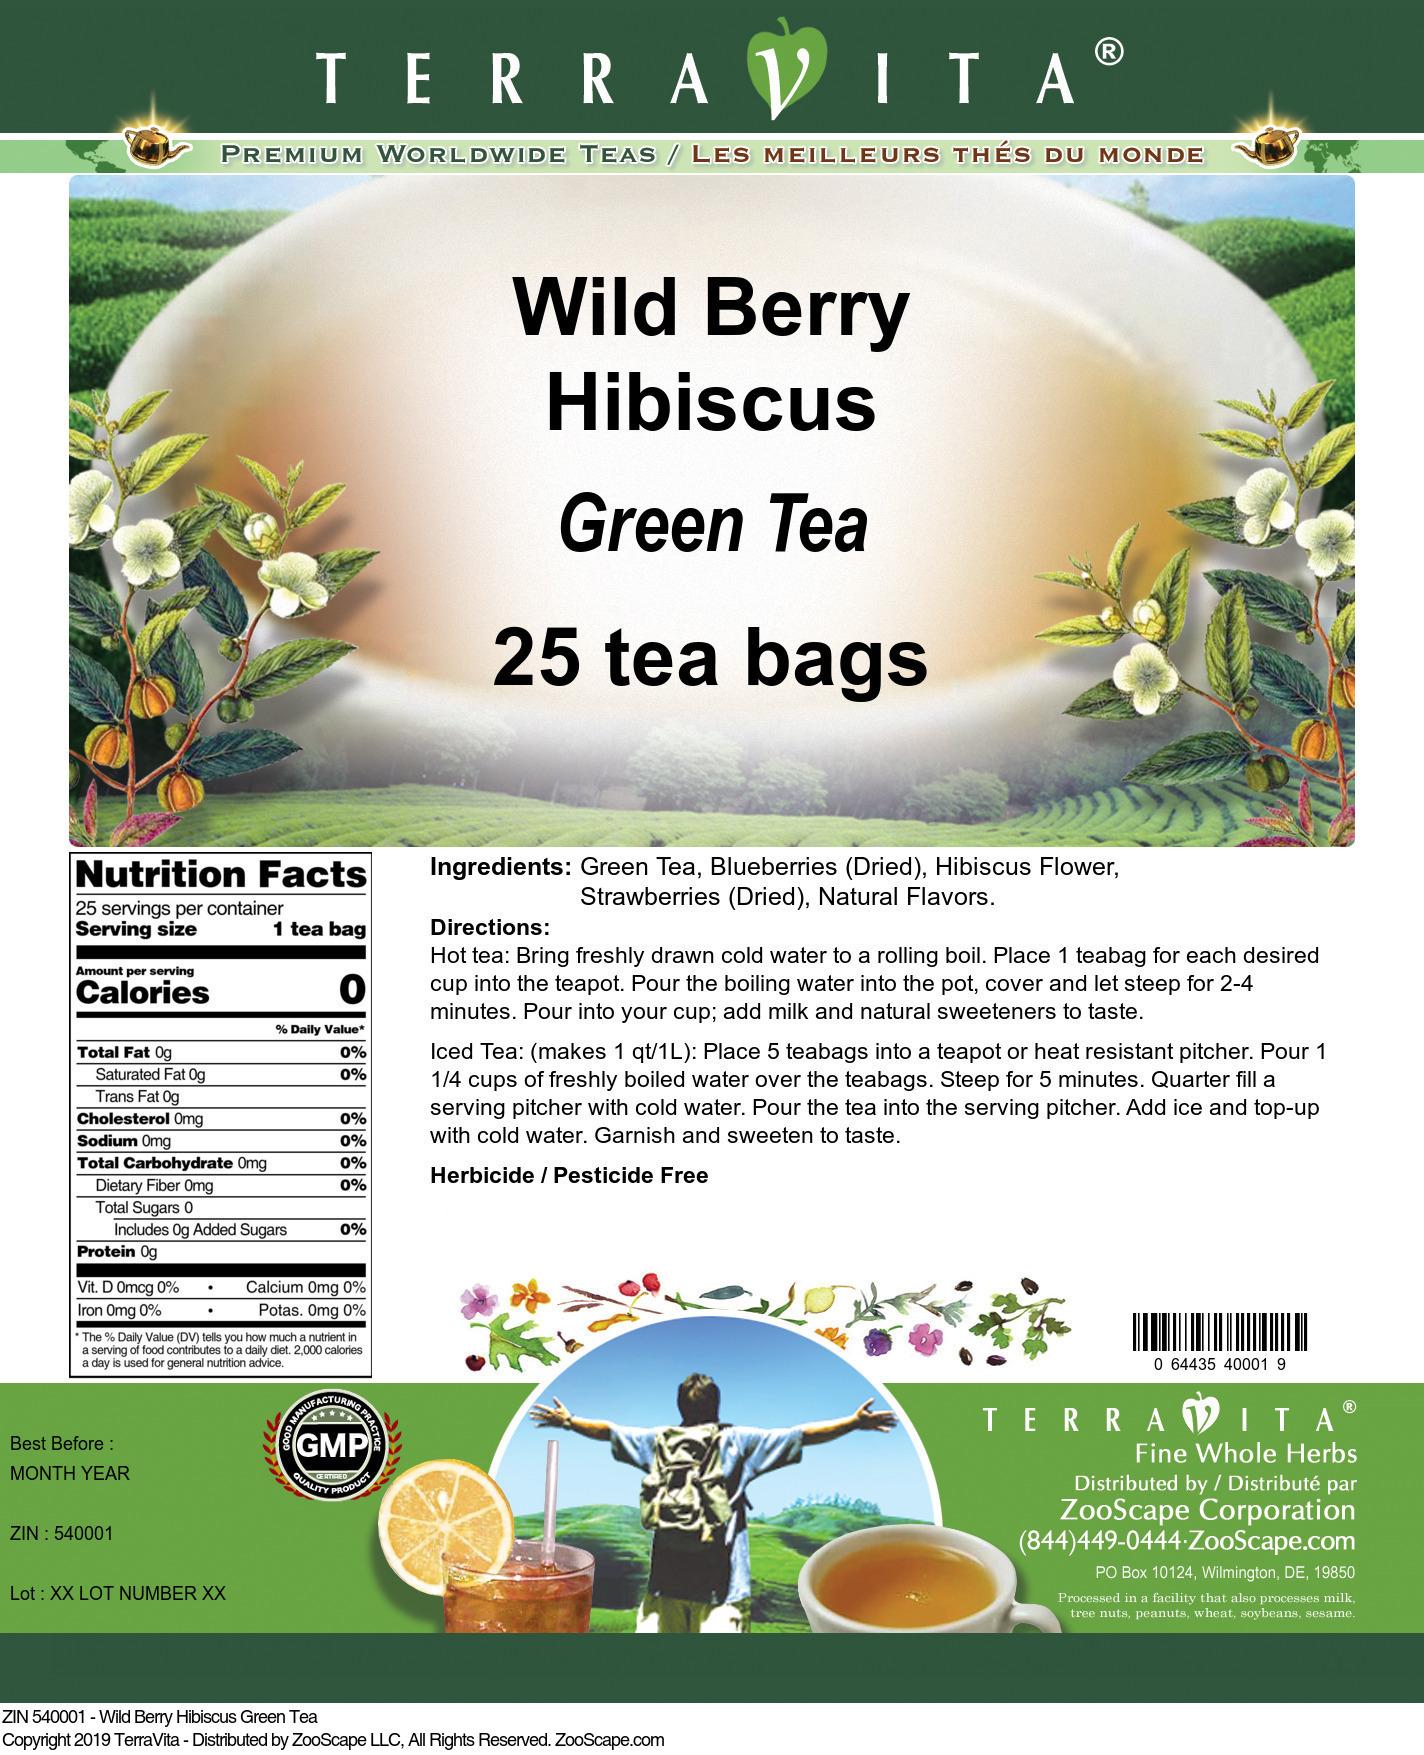 Wild Berry Hibiscus Green Tea